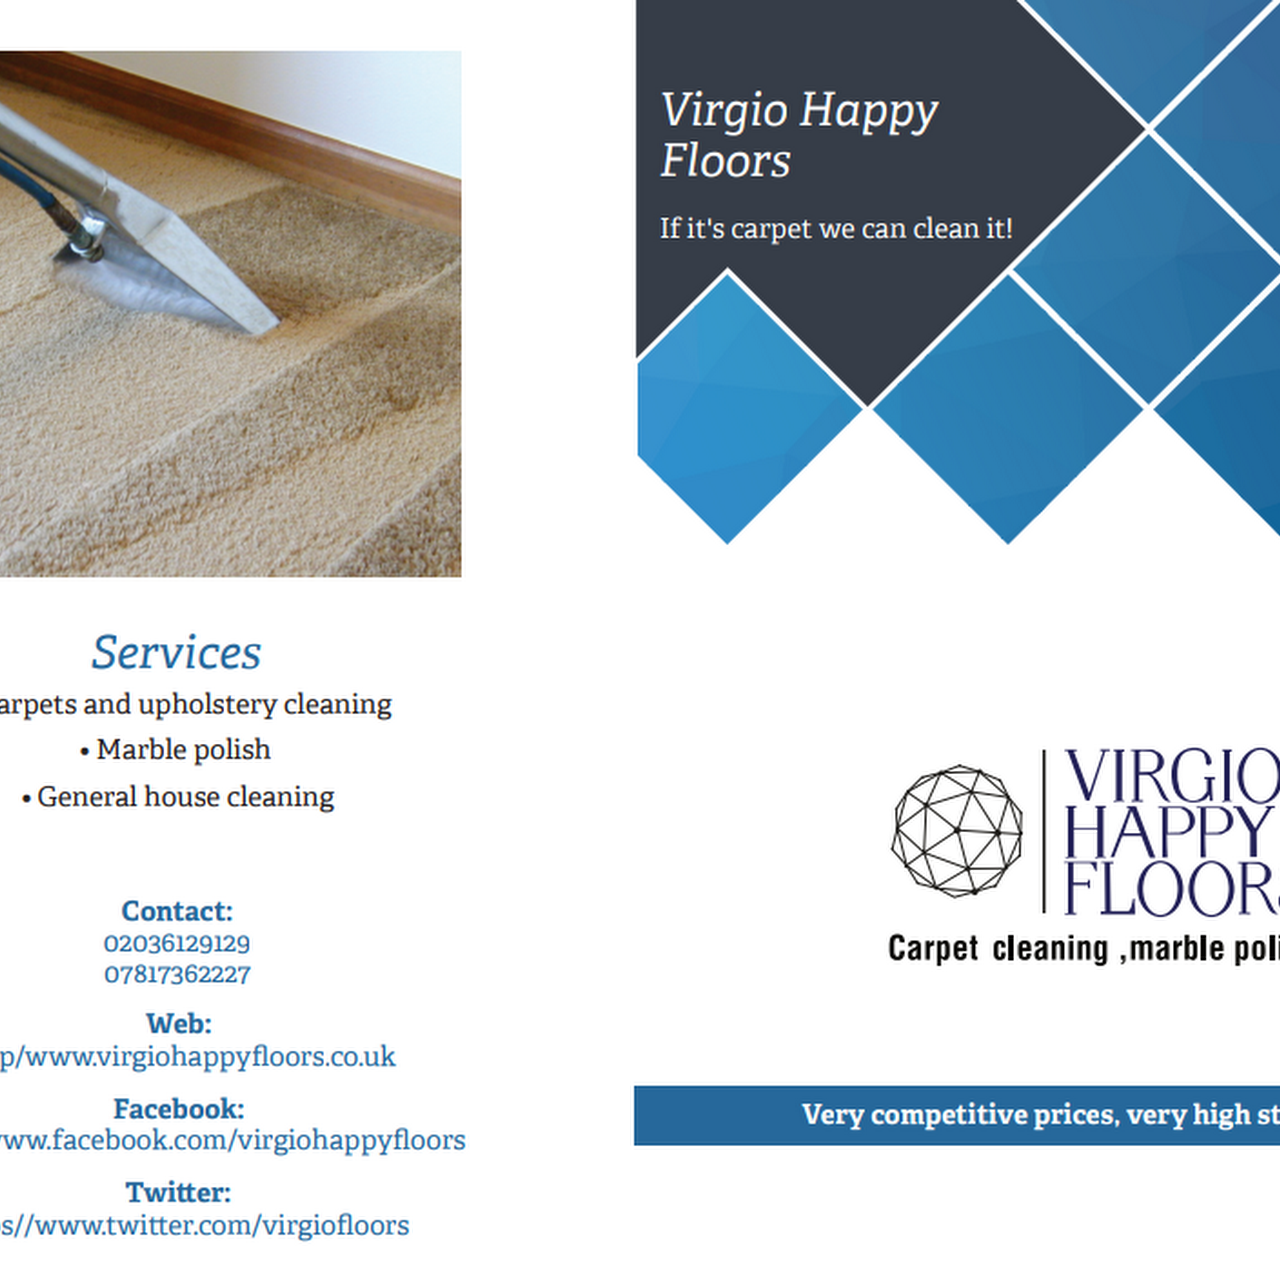 Virgio Happy Floors Carpet Cleaning Service - Happy floors customer service